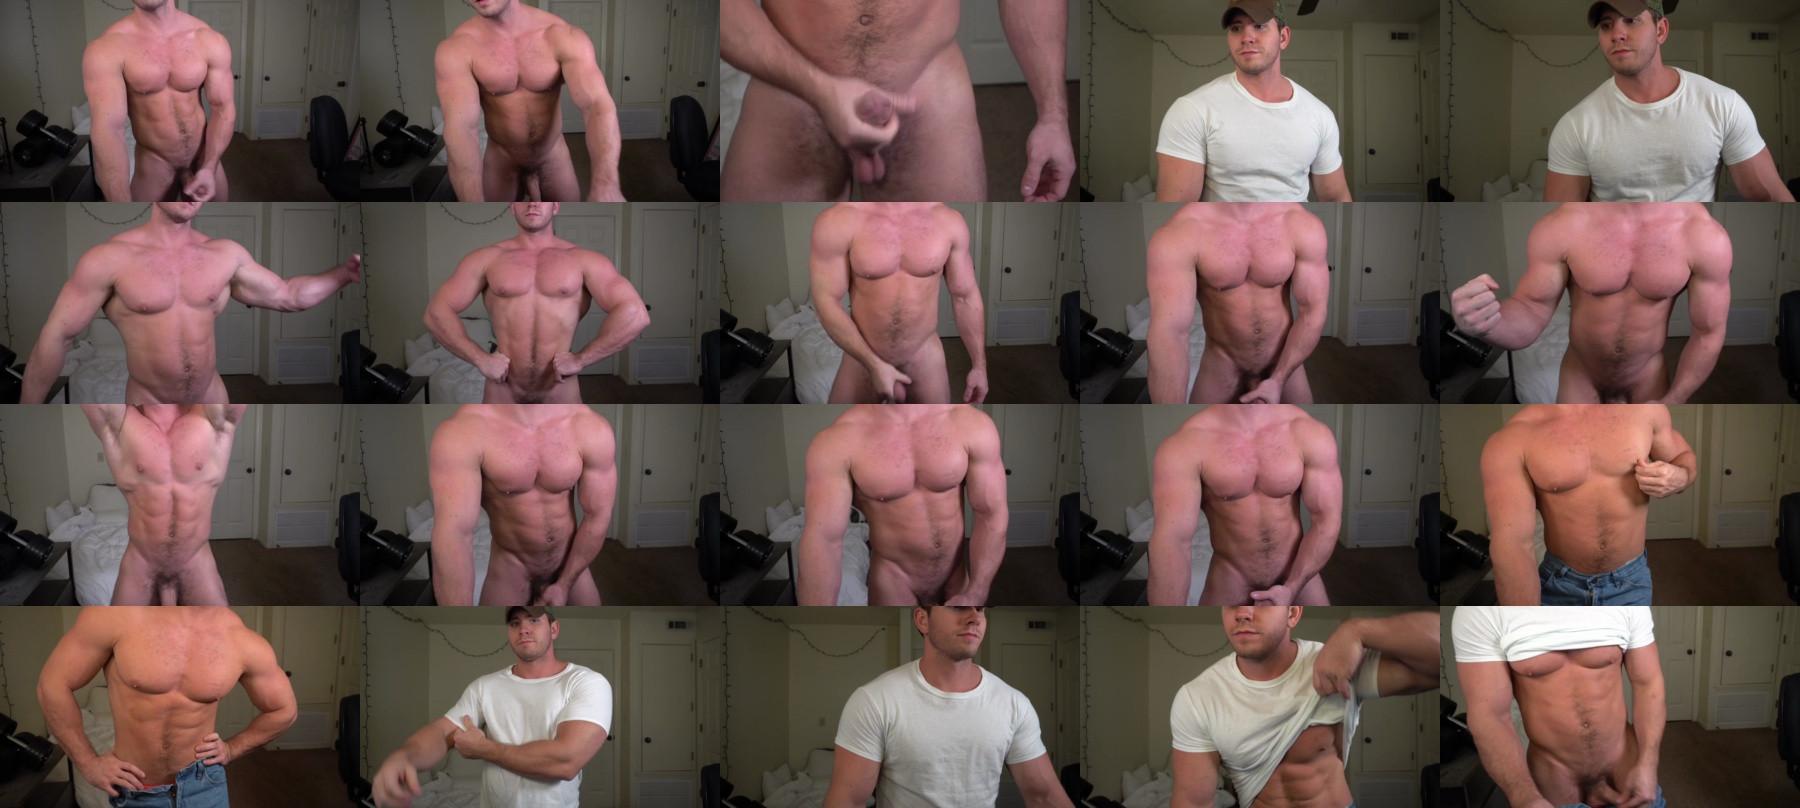 Hotmuscles6t9 Chaturbate 05-03-2021 Male Pretty